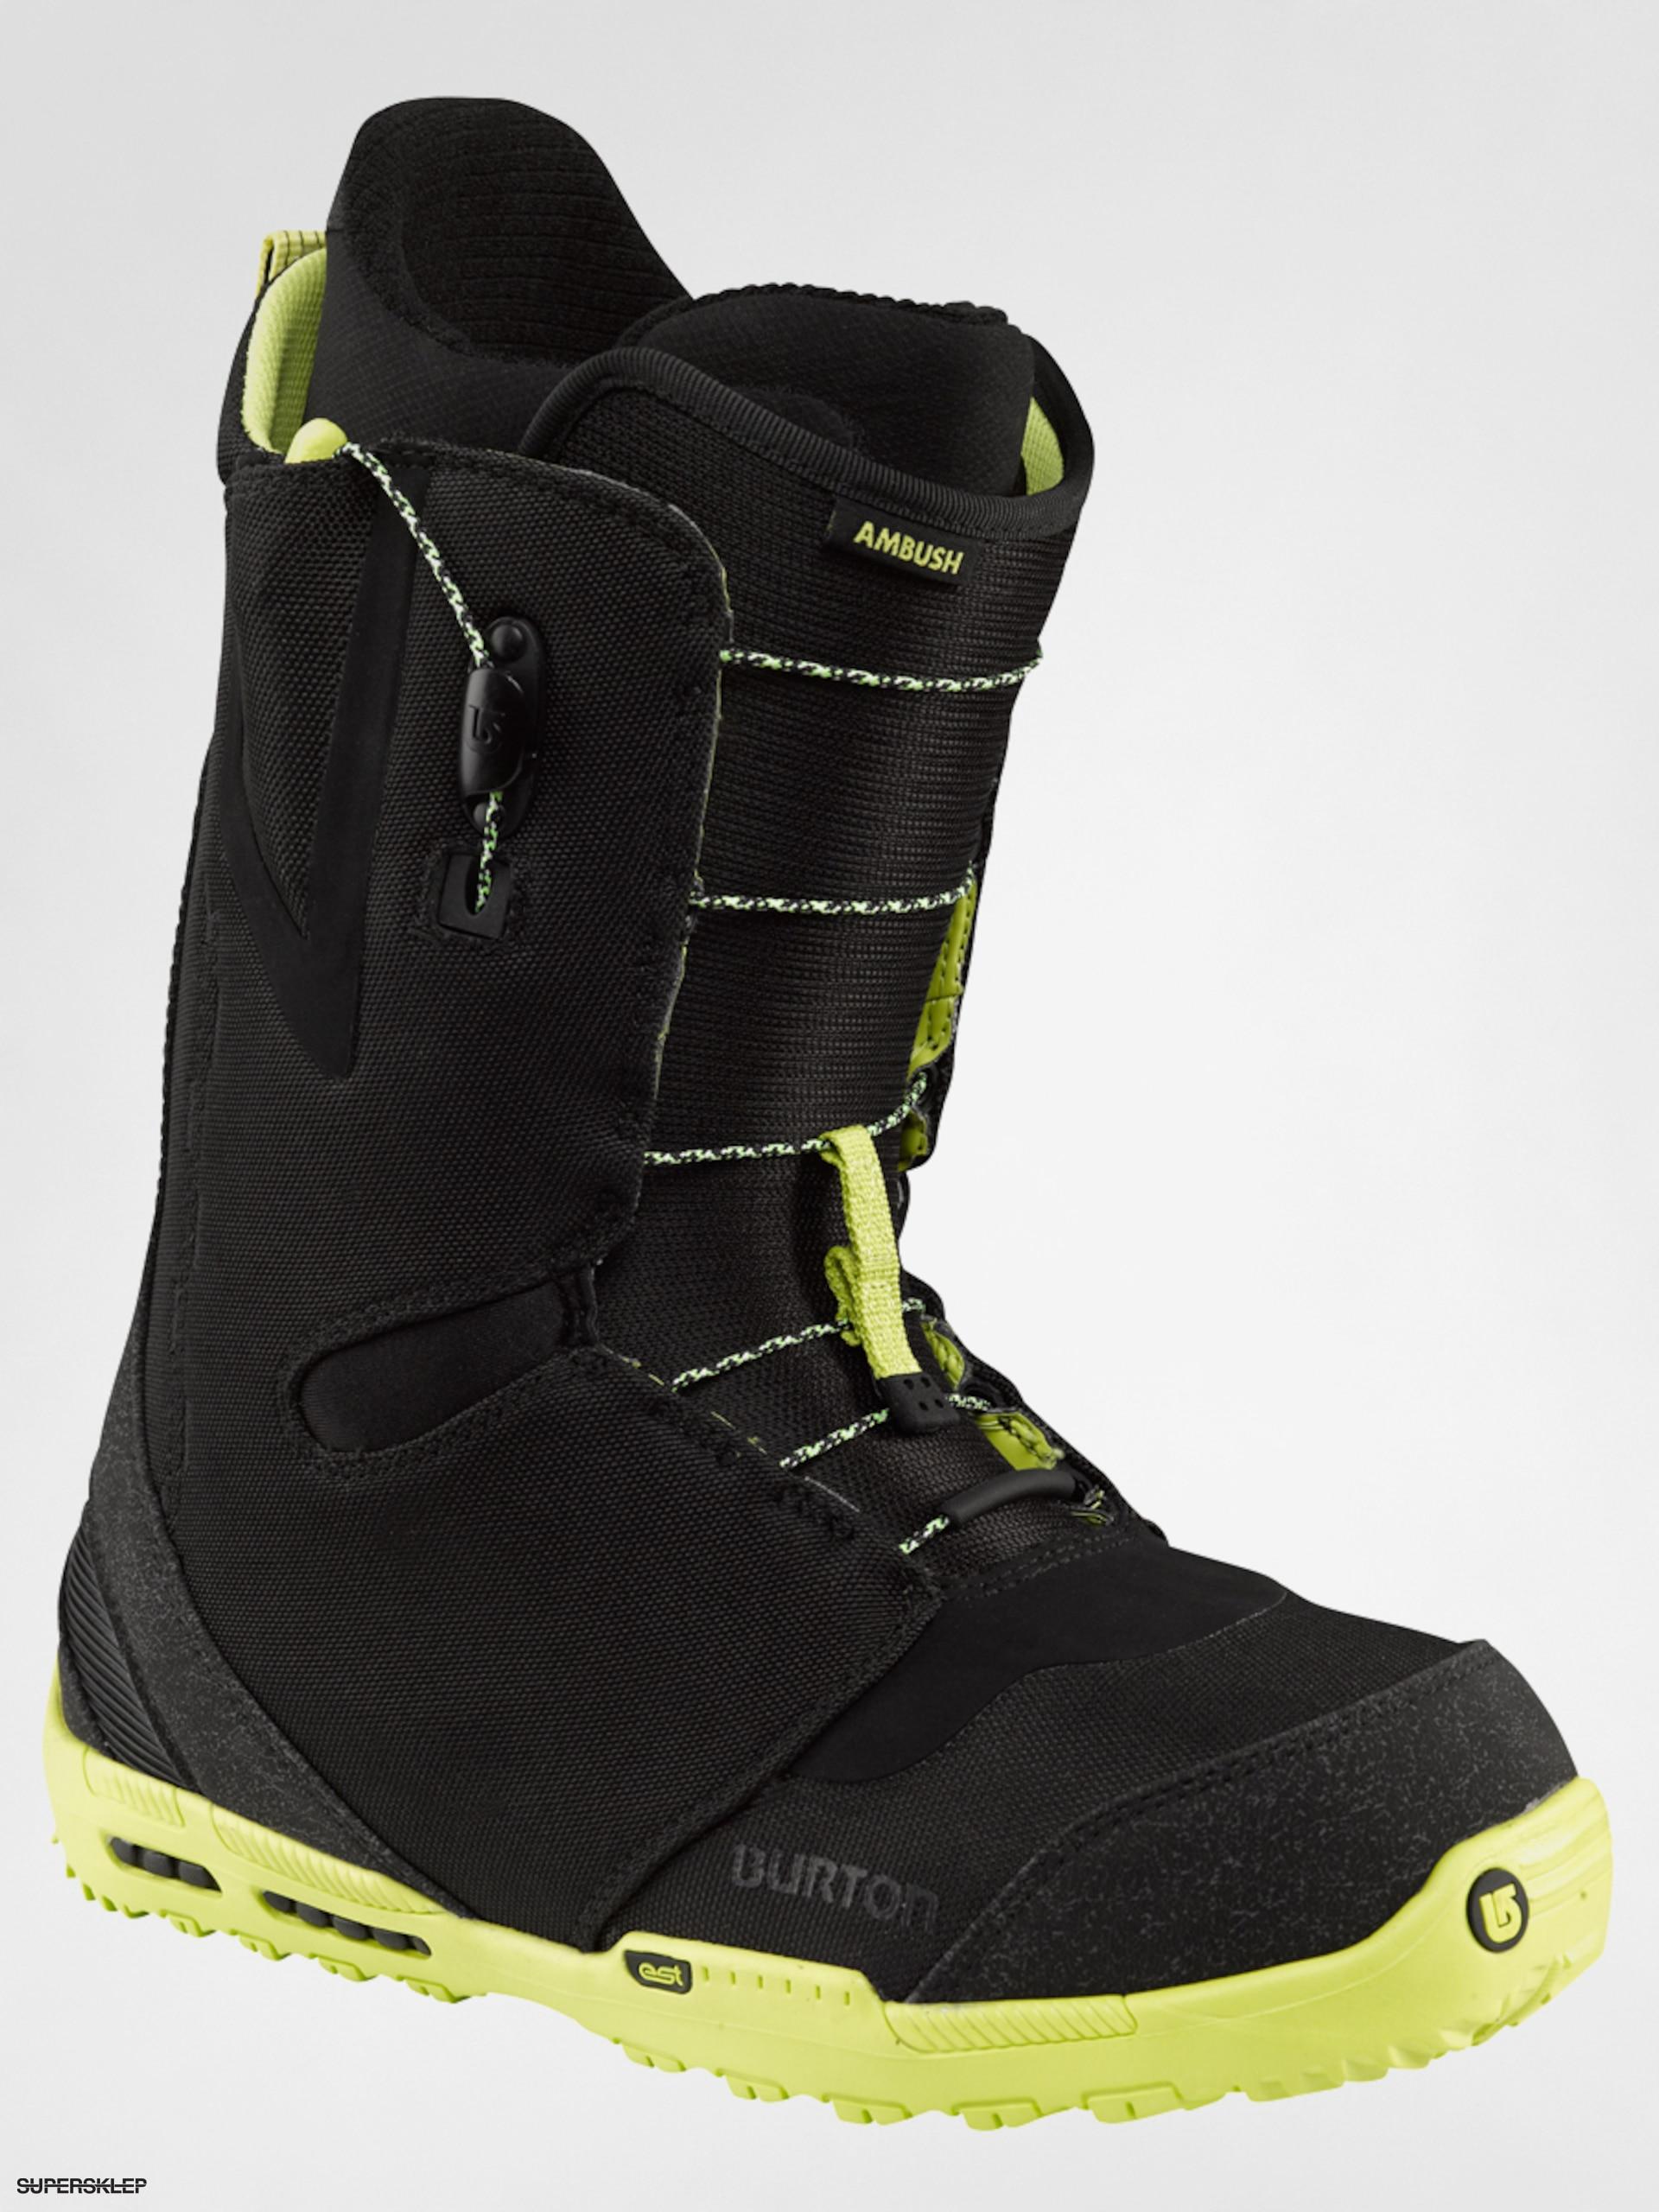 Buty snowboardowe Burton Ambush (blacklime)